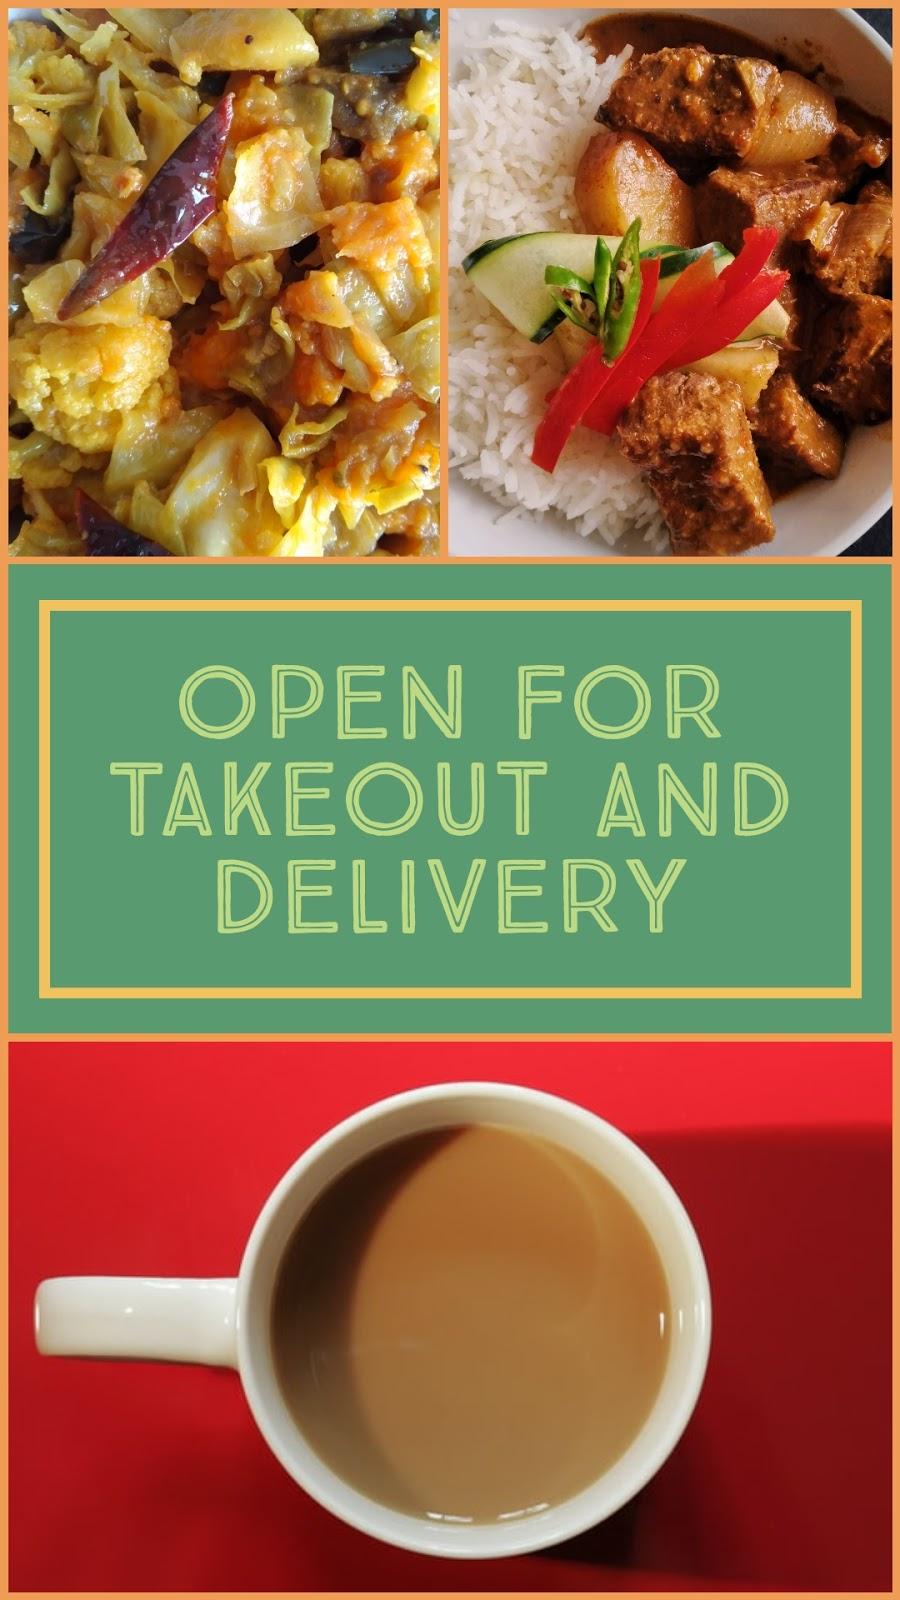 TexMasala - restaurant  | Photo 8 of 10 | Address: 6403 Sierra Blanca Dr, Houston, TX 77083, USA | Phone: (346) 256-3303